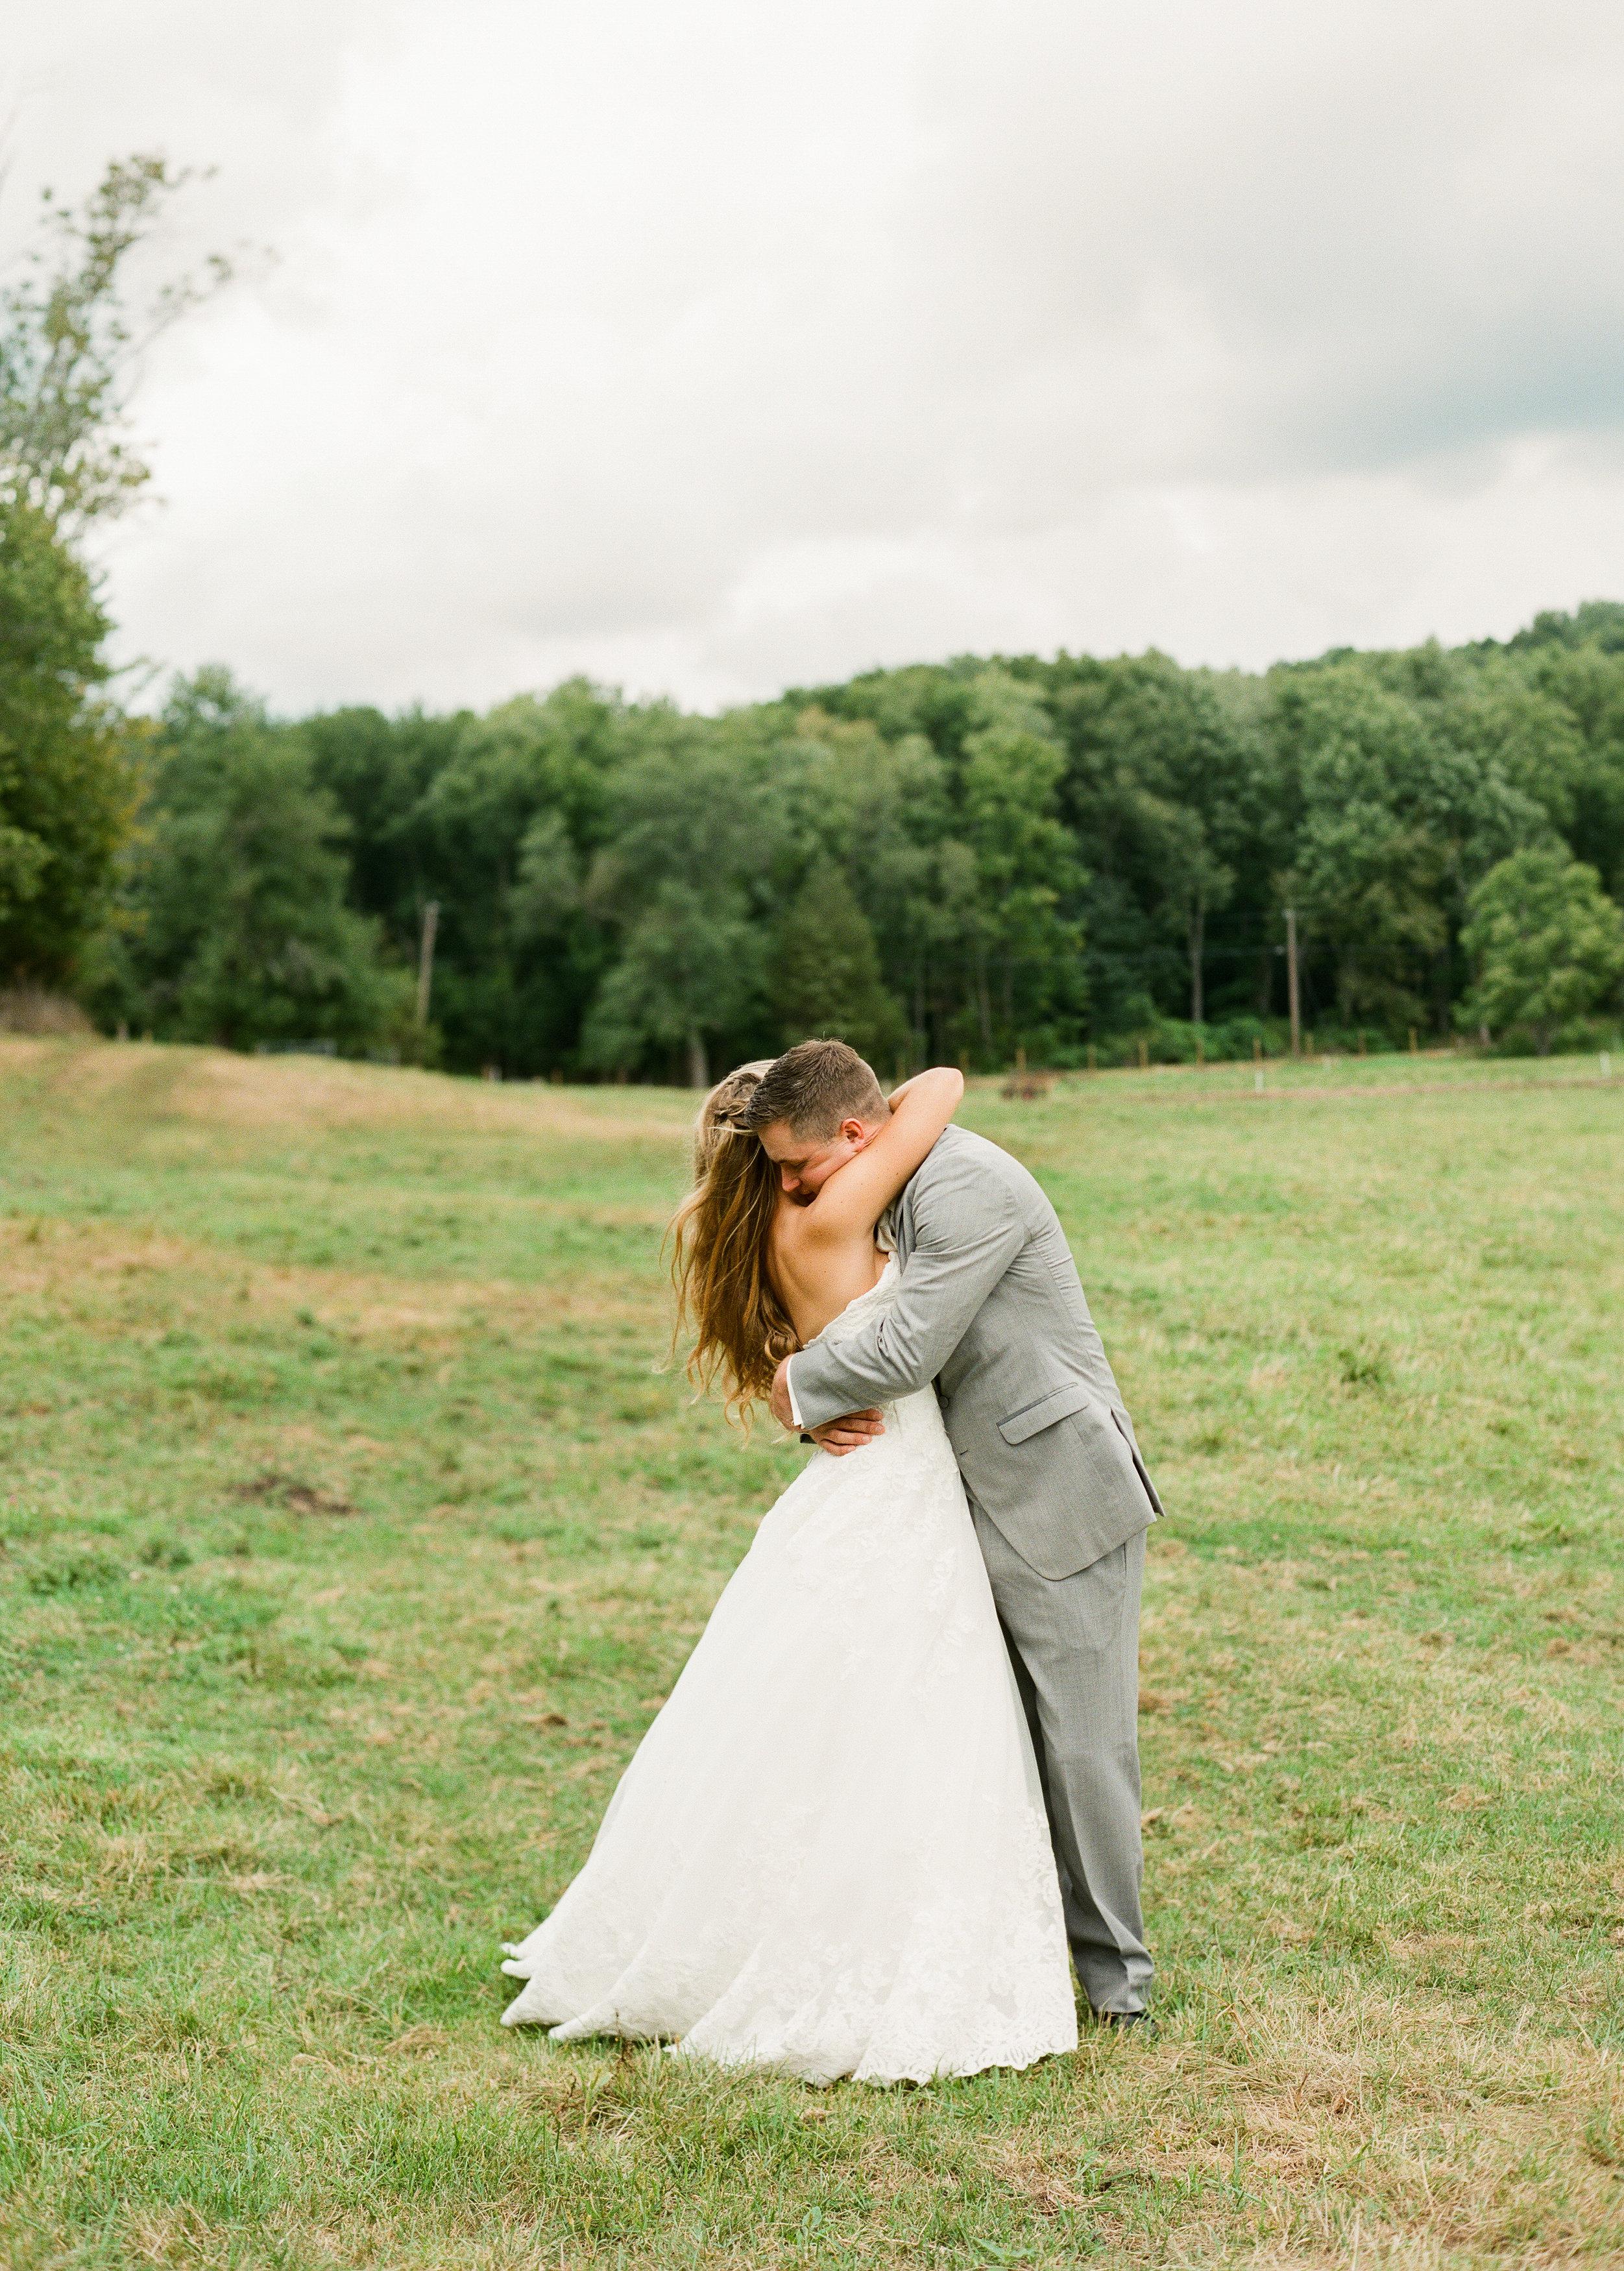 Stephanie&Dan-Wedding-LindsayMaddenPhotographyII-58